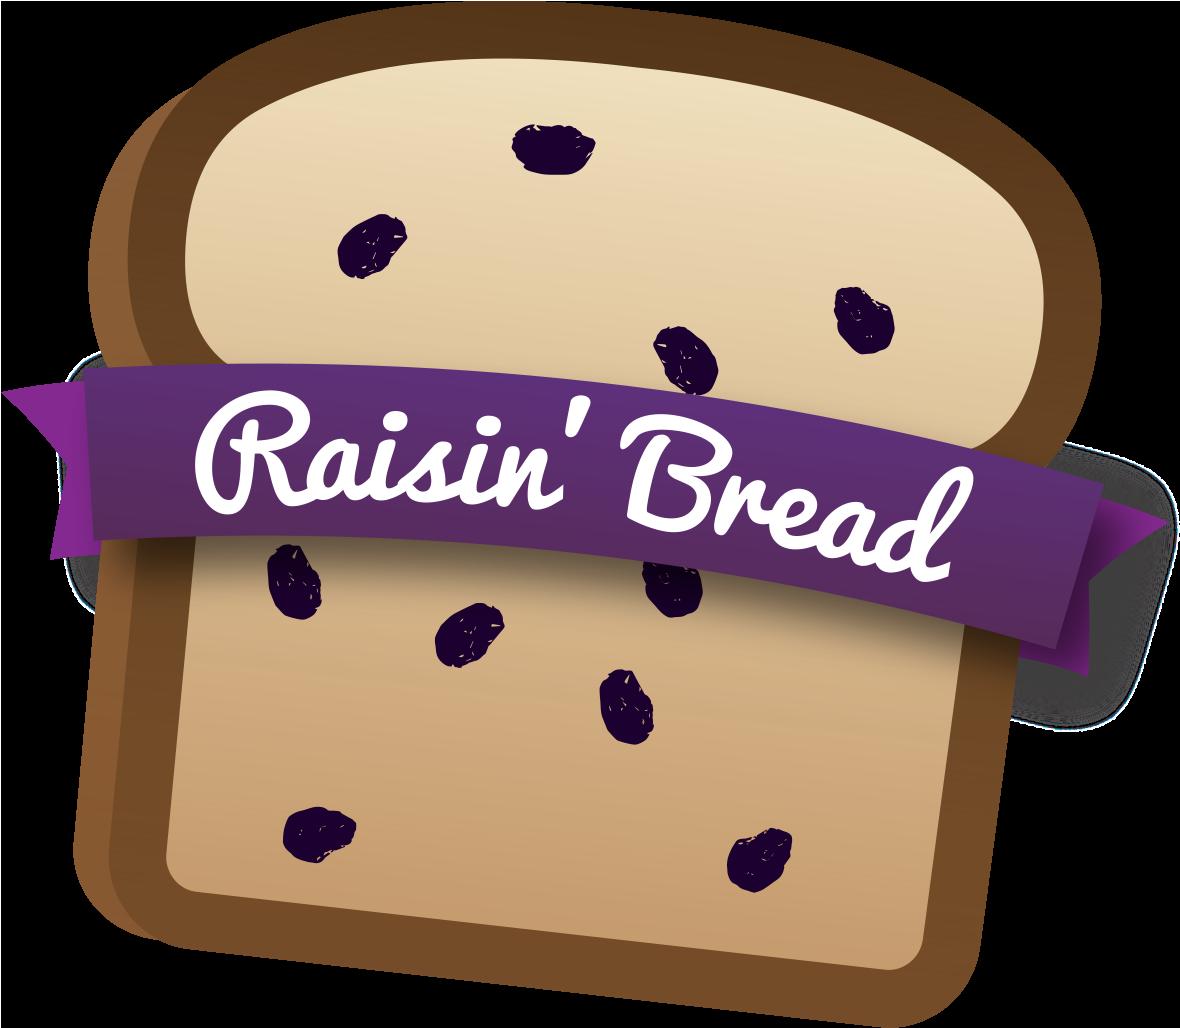 Clipart bread raisin bread. Grace university giving day